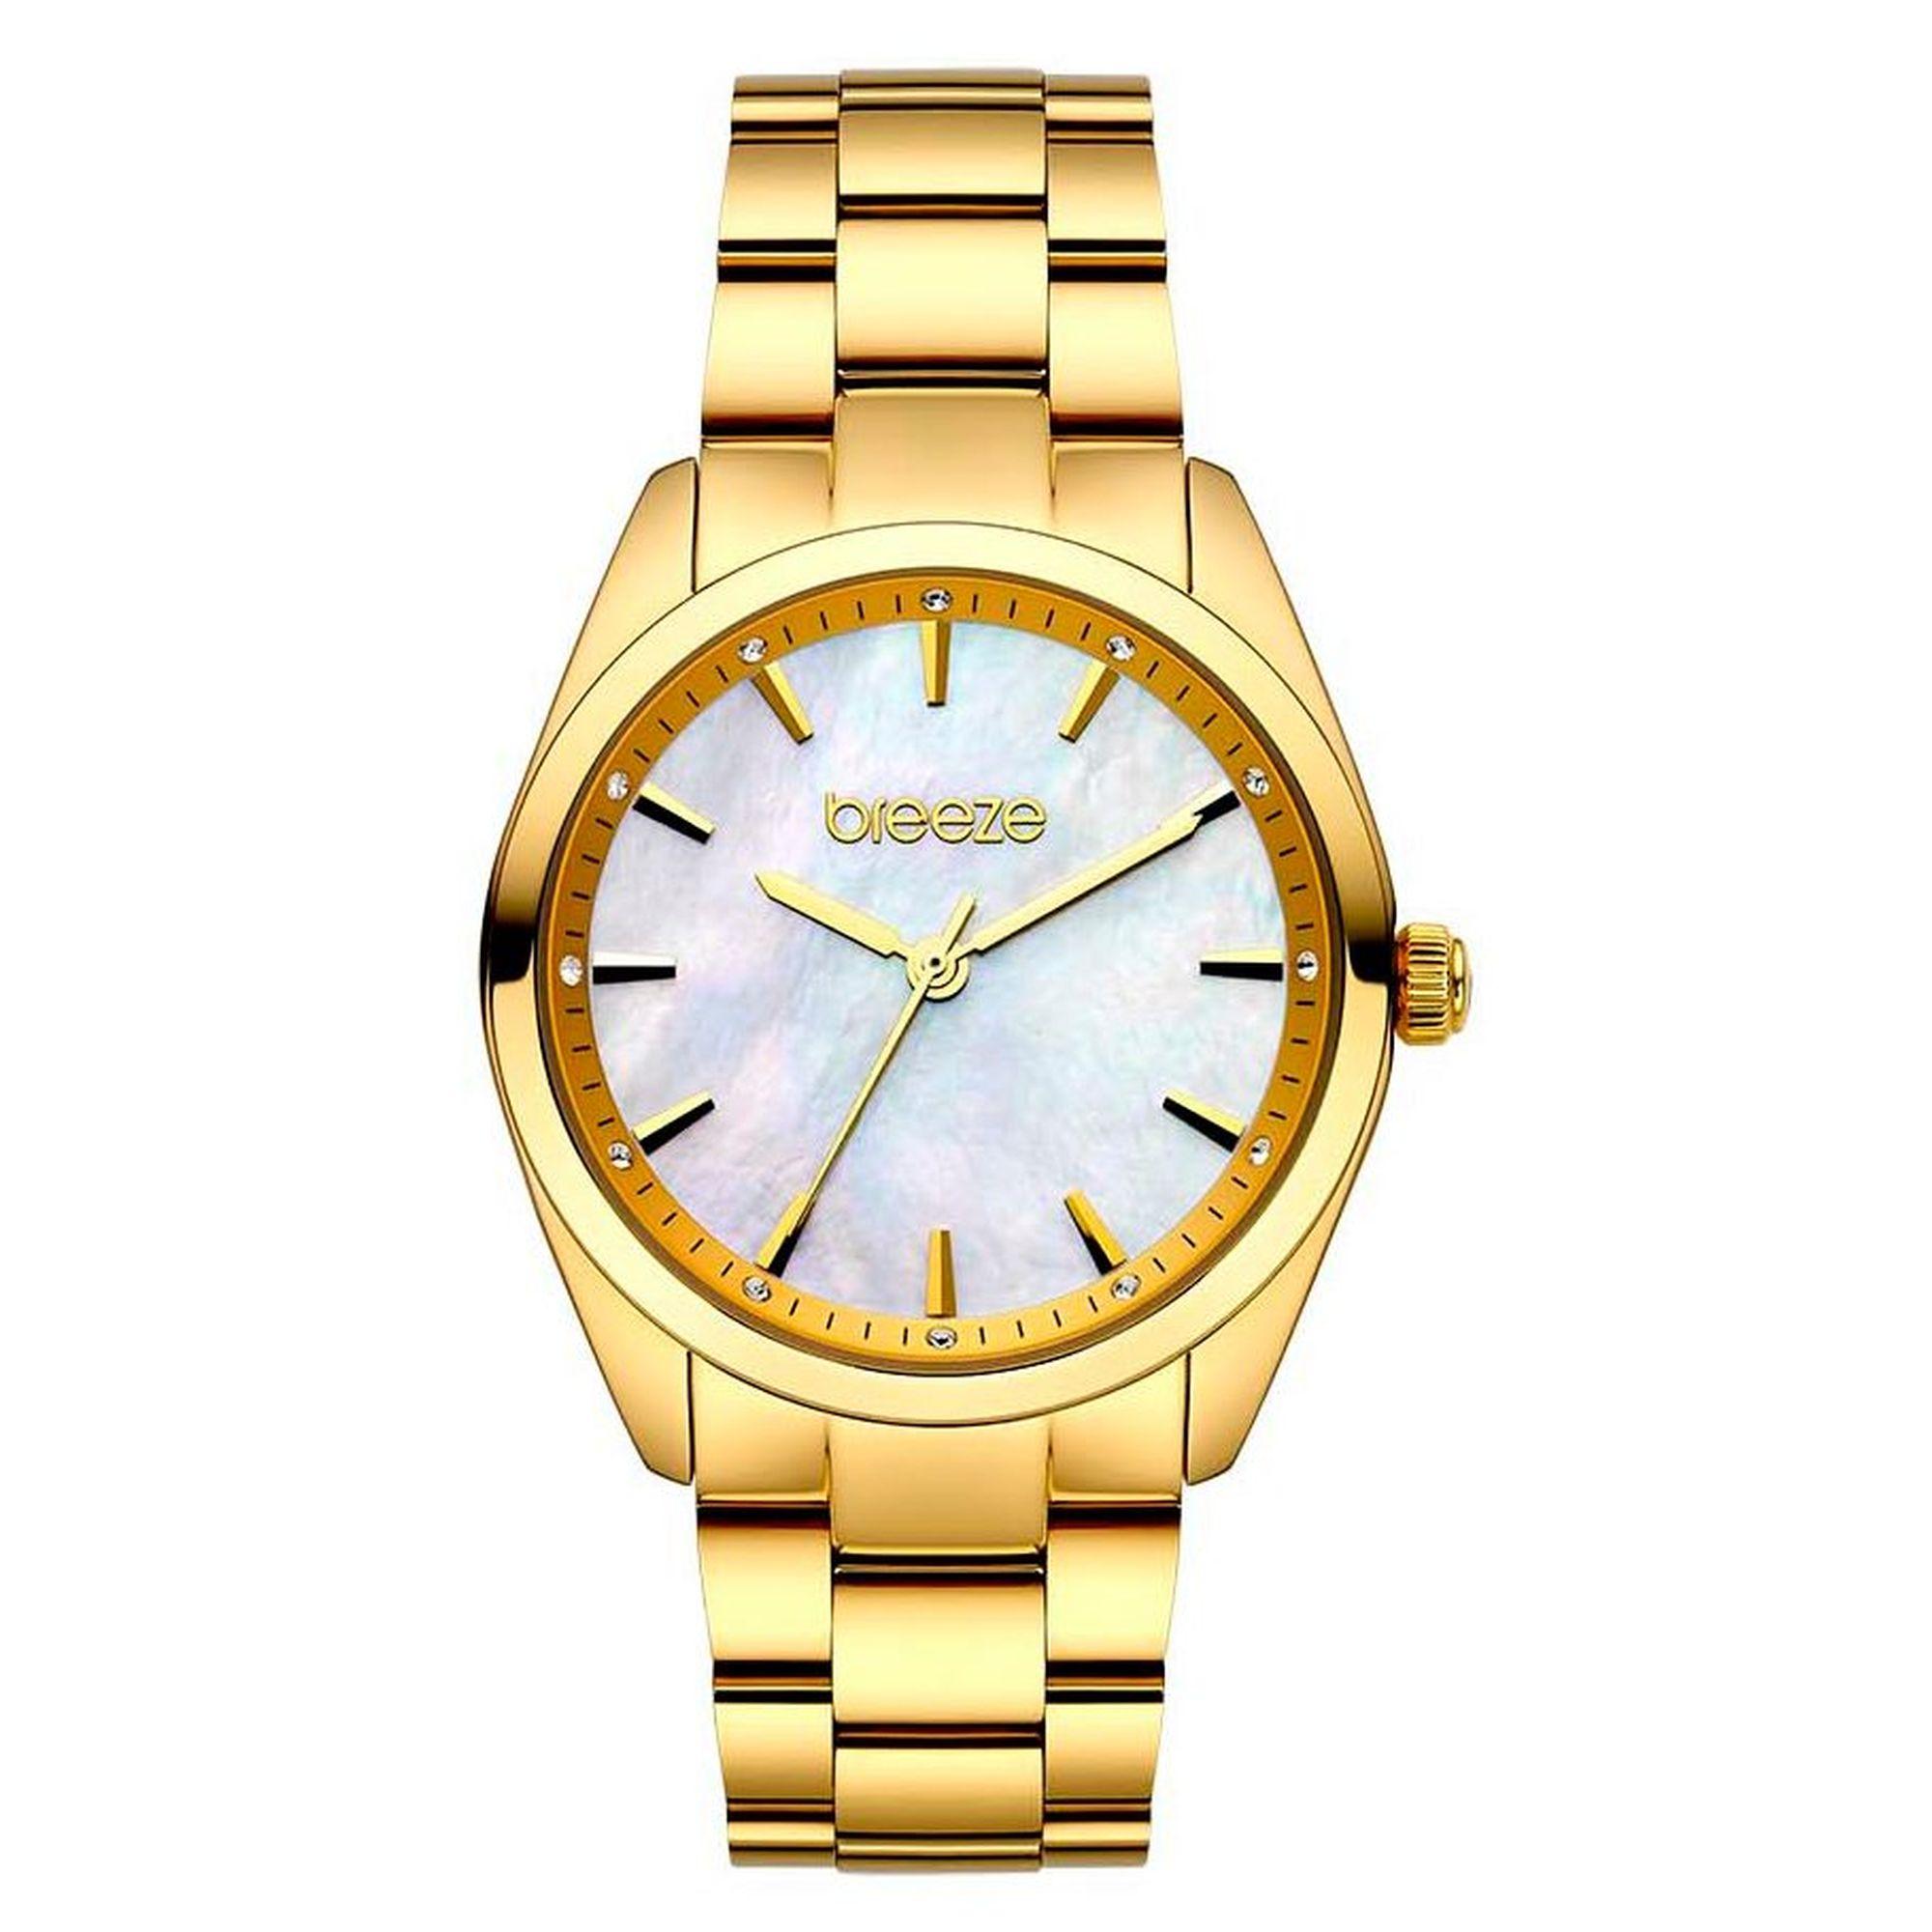 breeze, ρολόγια Breeze, γυναικεία ρολόγια, Δωρεάν μεταφορικά, Άμεση Διαθεσιμότητα, Breeze Finesse Gold 212051.1